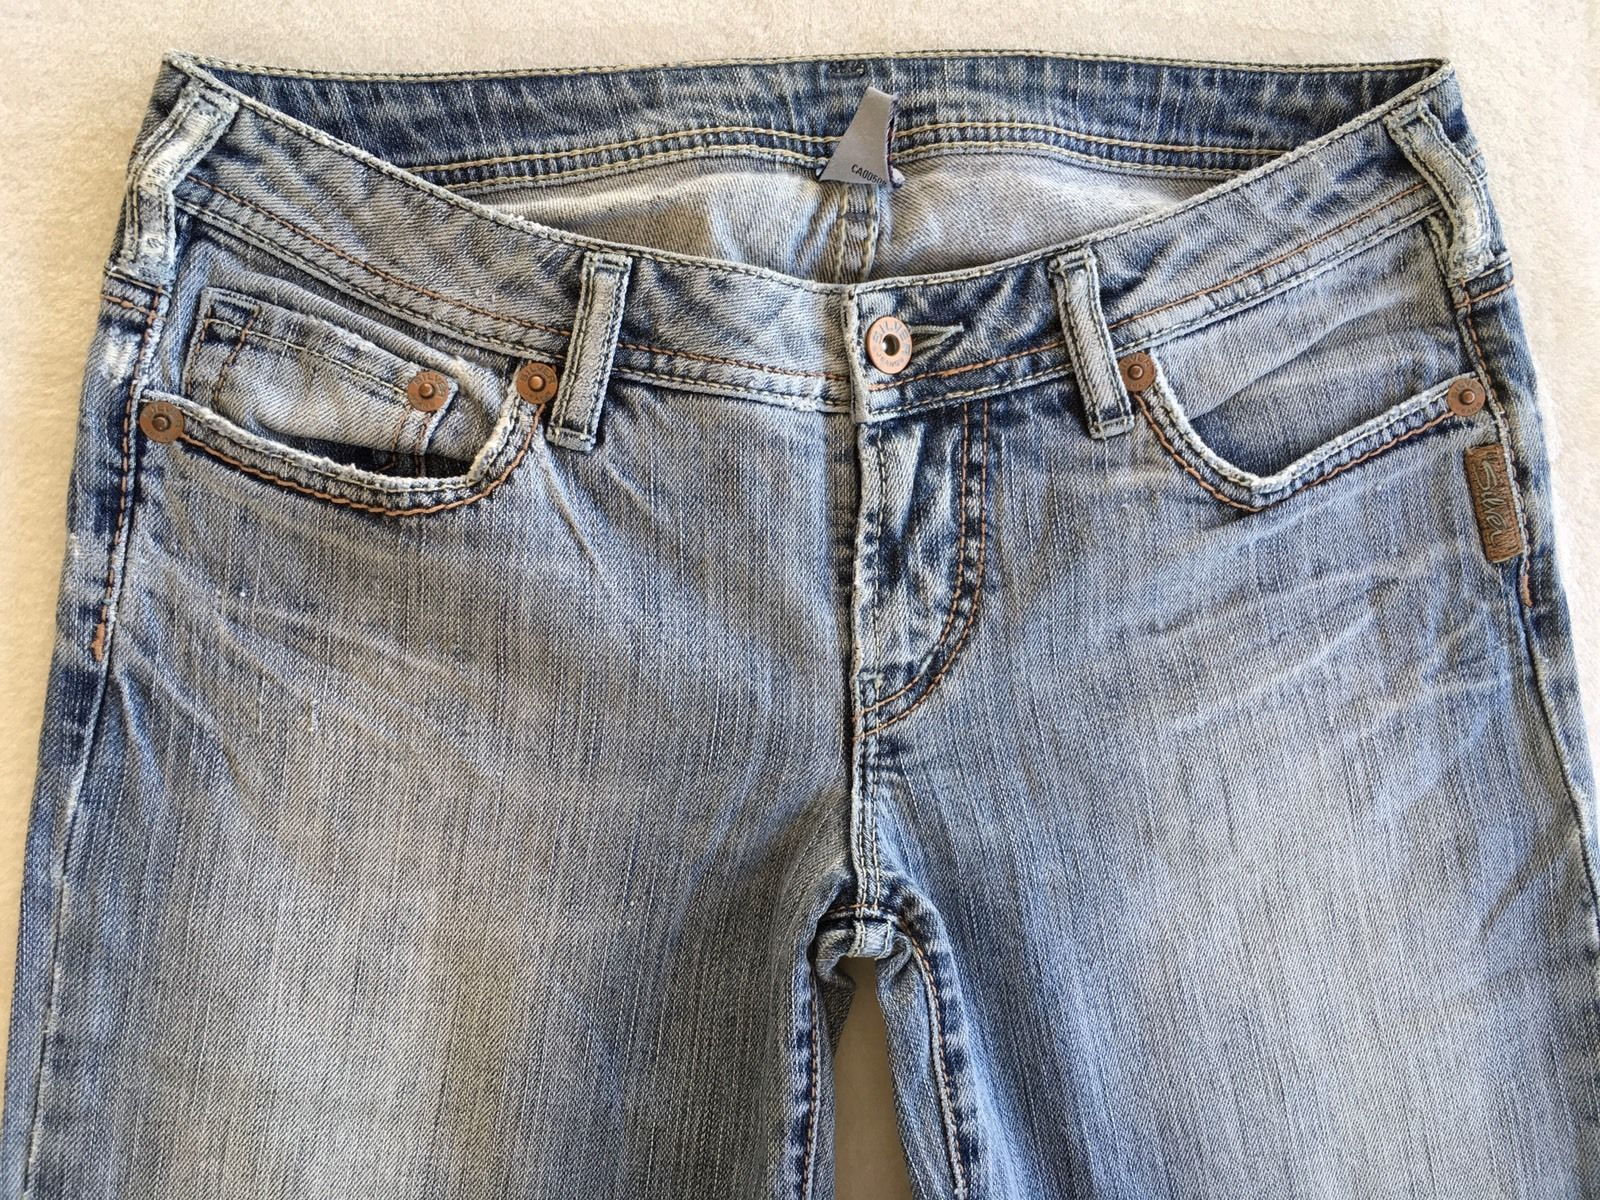 SILVER JEANS Sale New Light Buckle Low Rise Denim Stretch Jean Bermuda Shorts 28